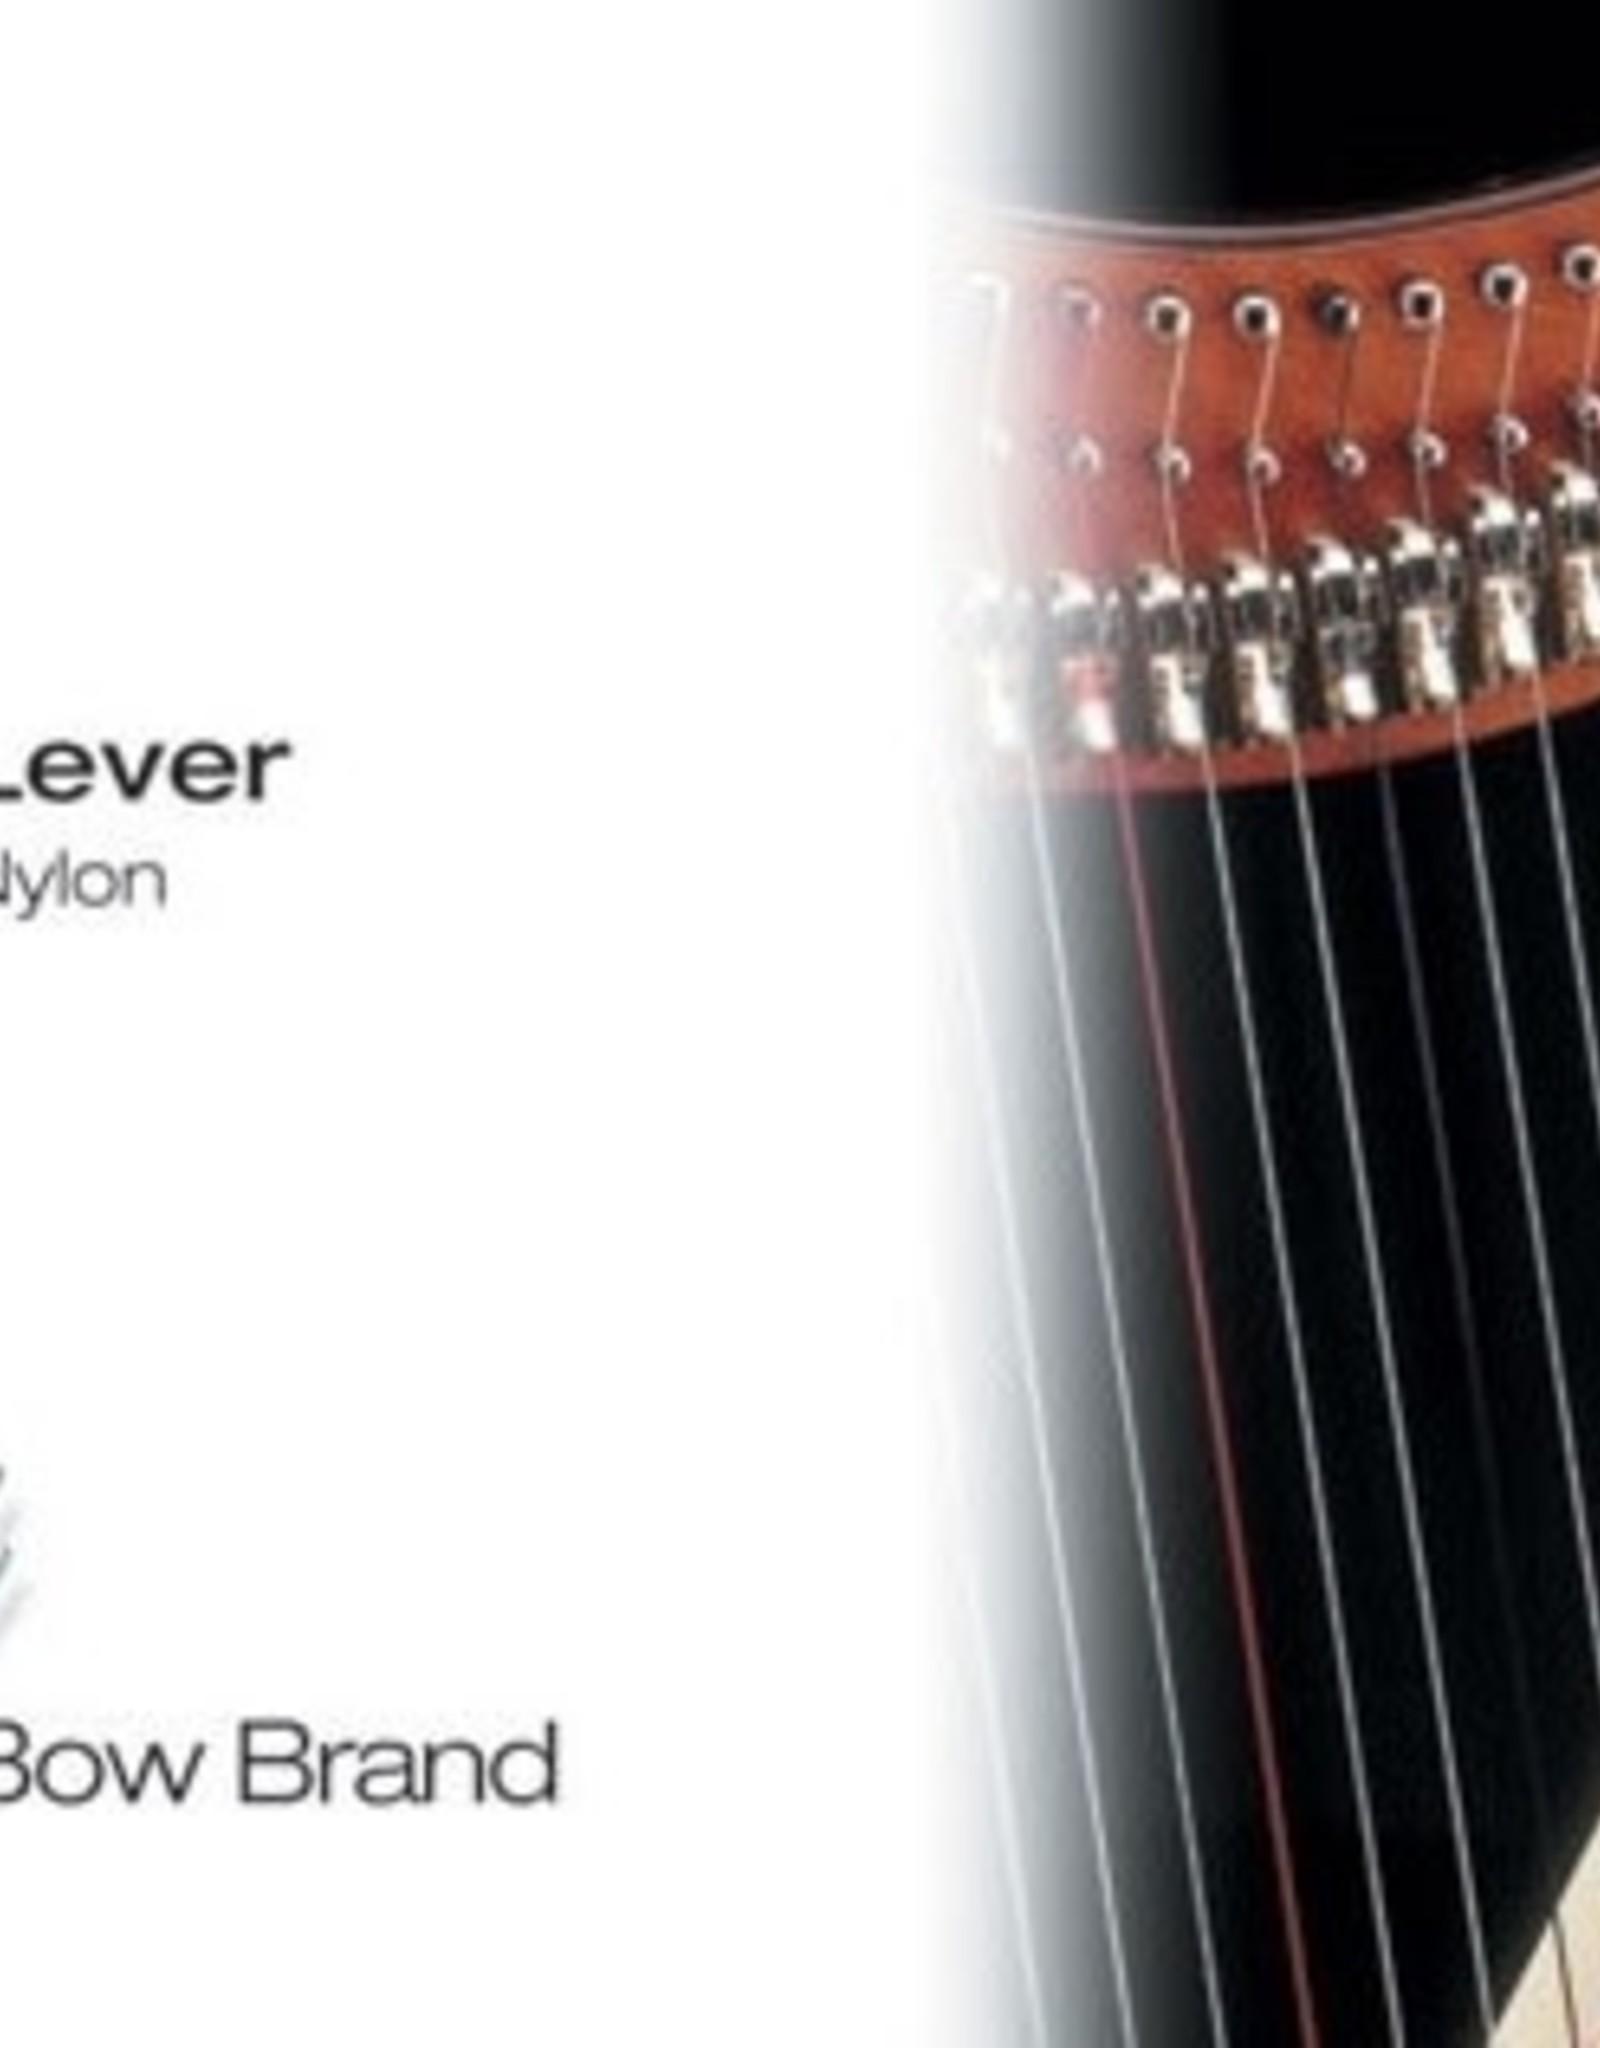 BOW BRAND  klep nylon - lever NYLON 26/4 la